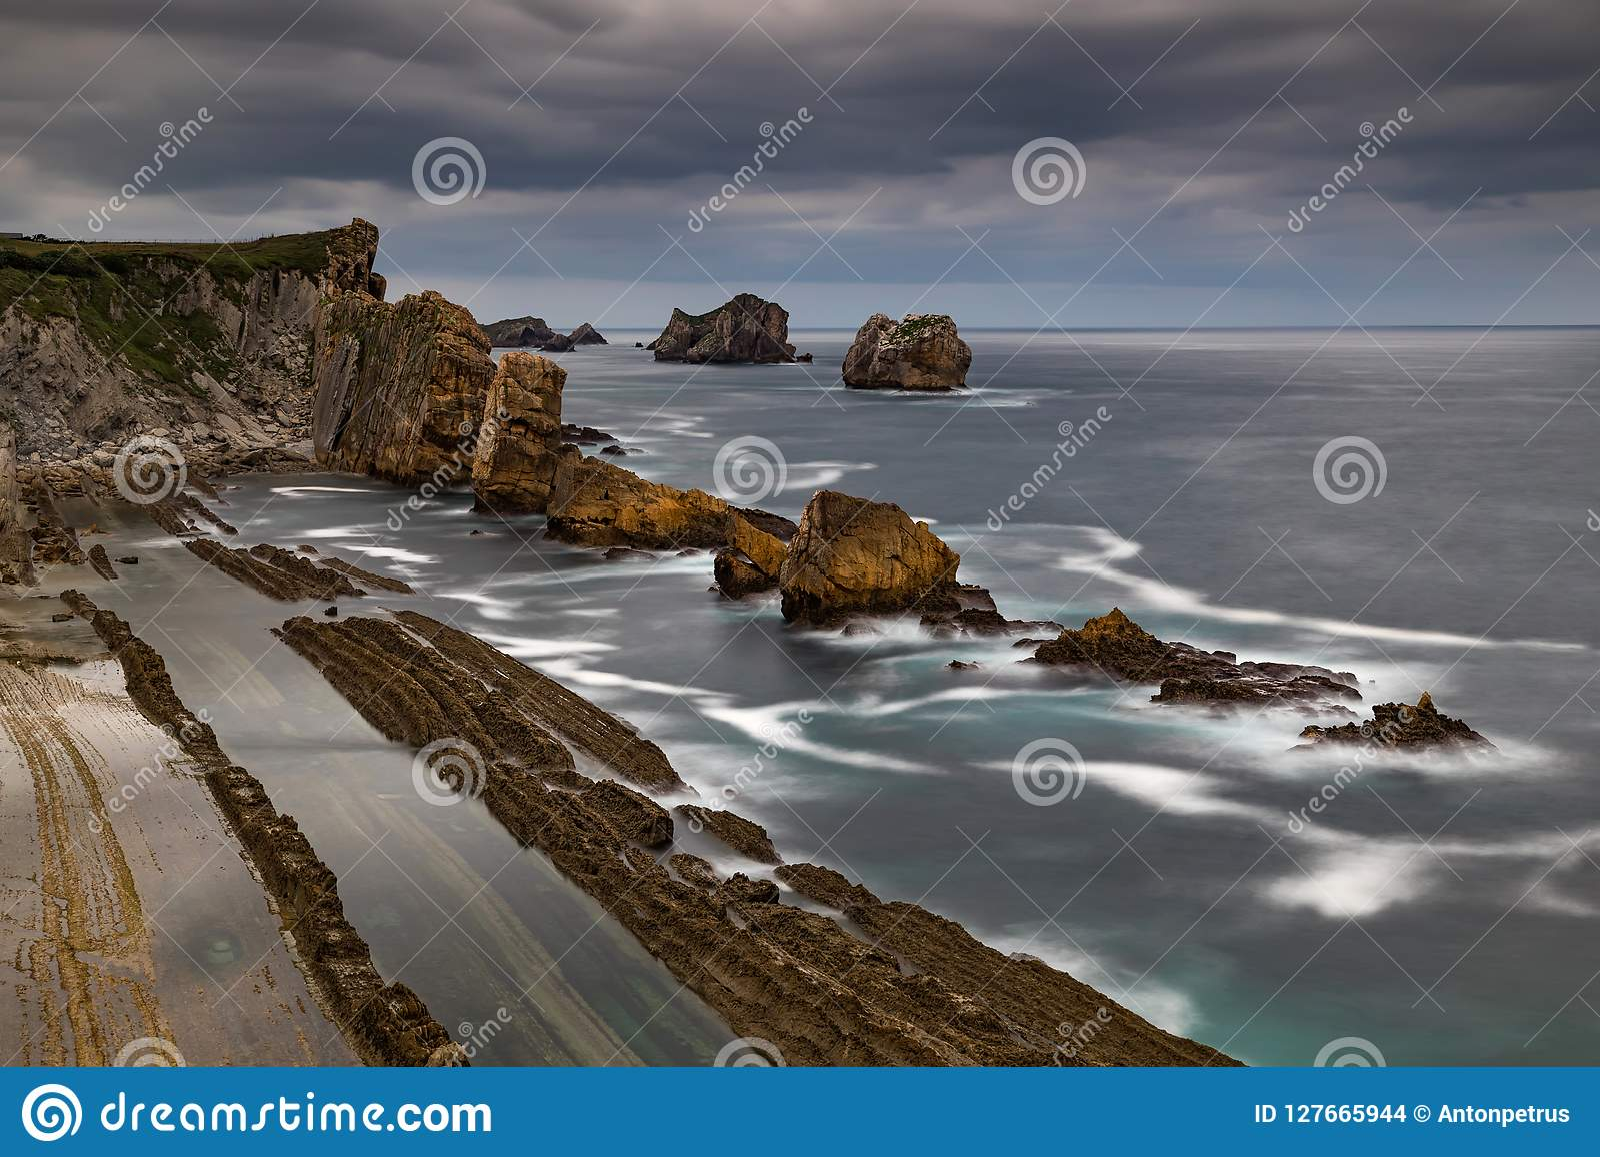 Opinión dramática Playa de la Arnia, Cantabria, España